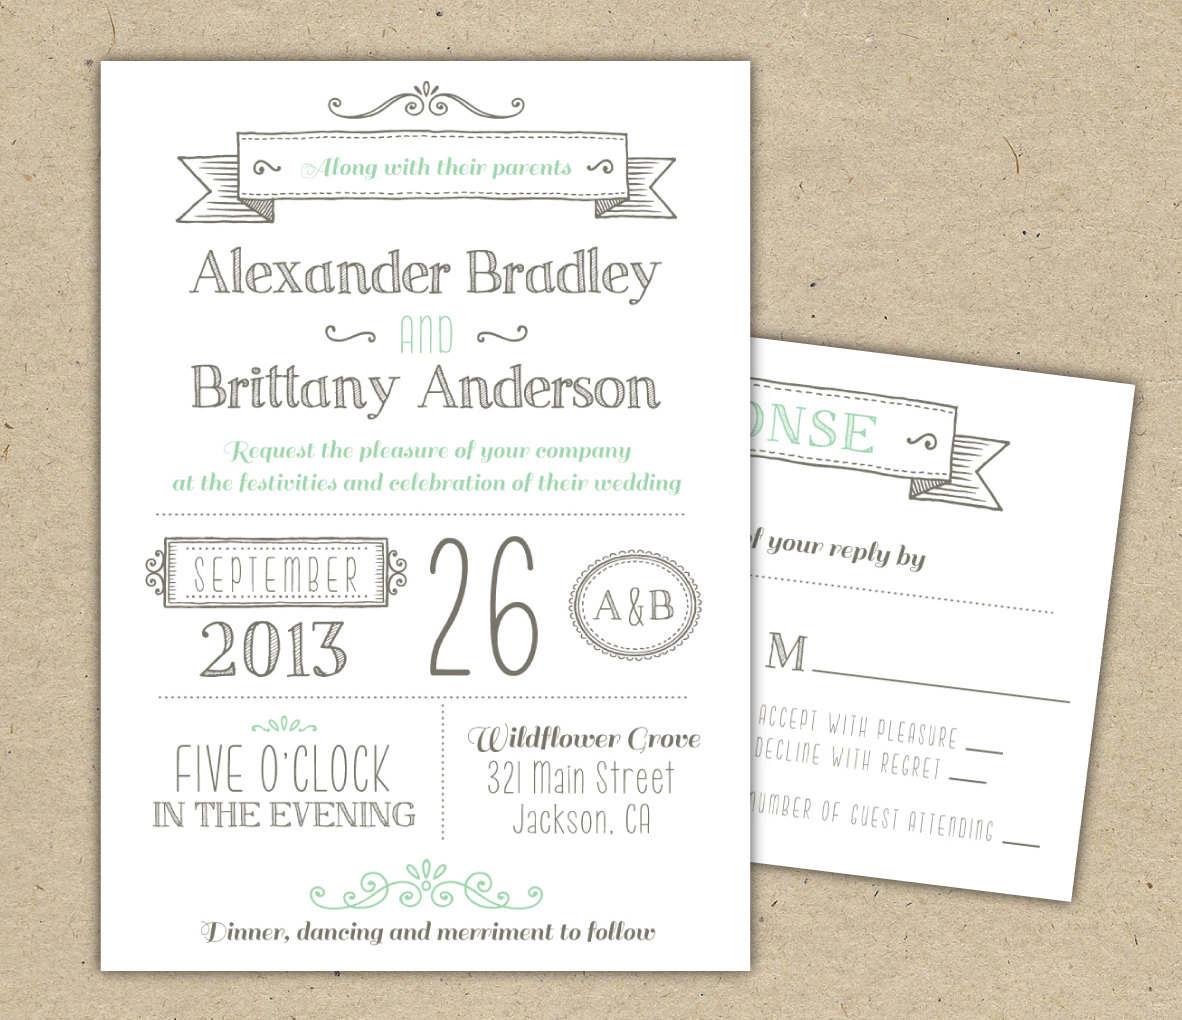 Wedding Ideas. Free Printable Wedding Invitation Templates - Free Printable Wedding Decorations